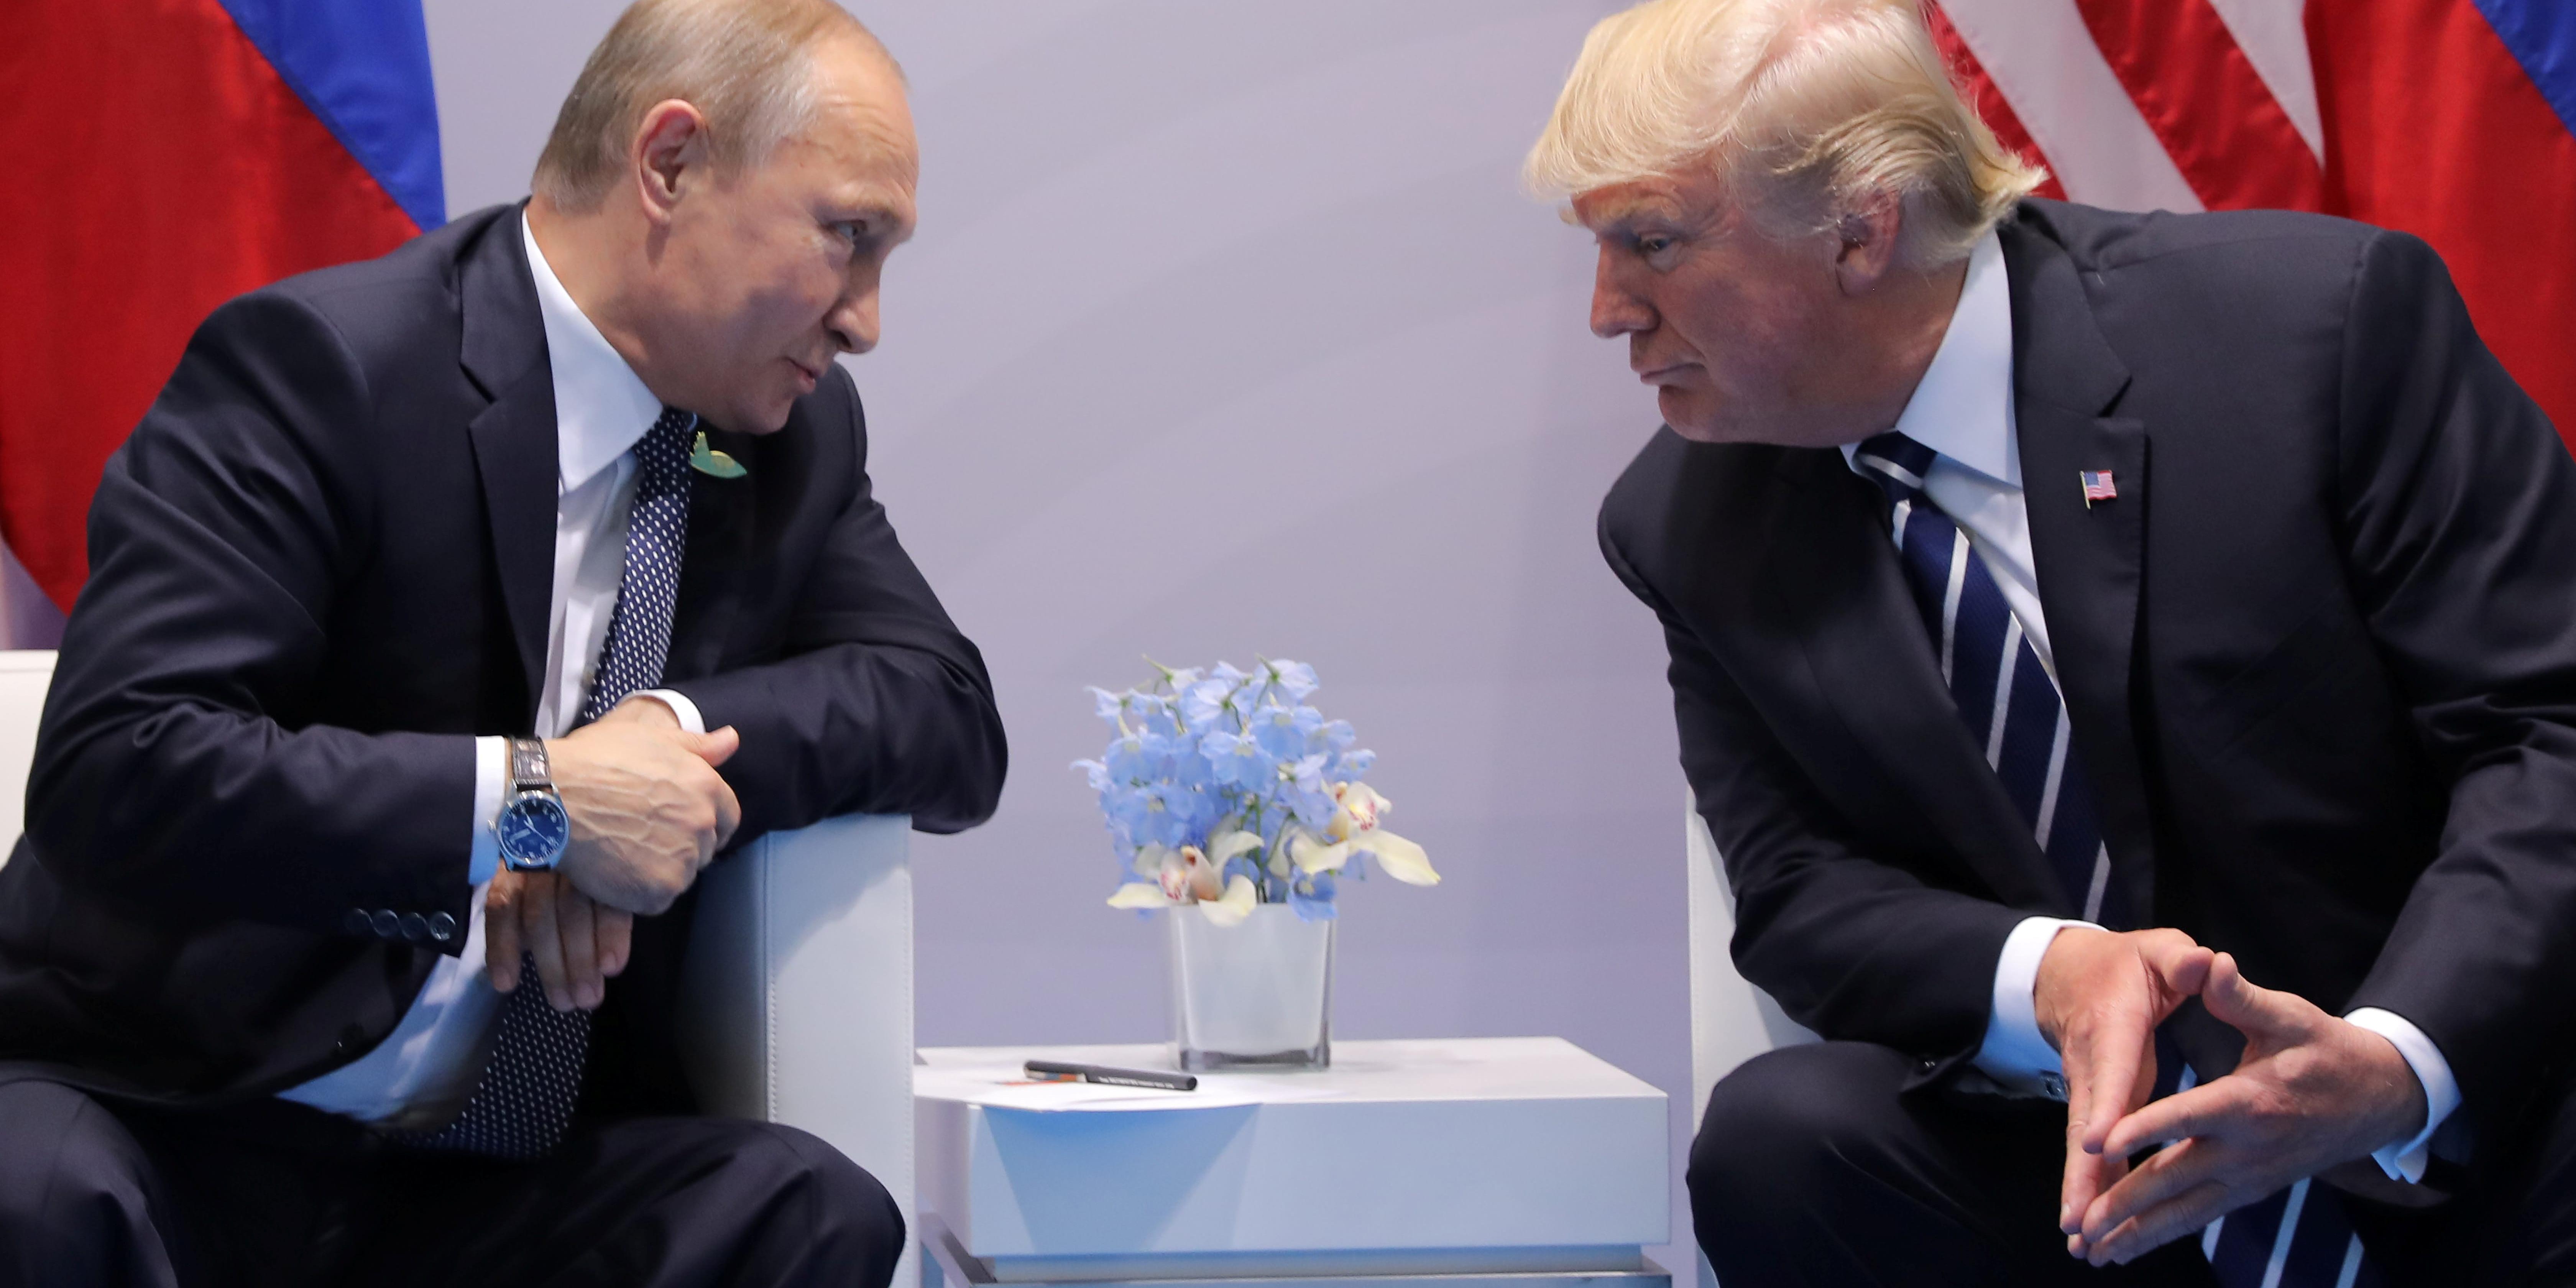 donald-trump-et-vladimir-poutine-au-g20-hambourg-etats-unis-russie